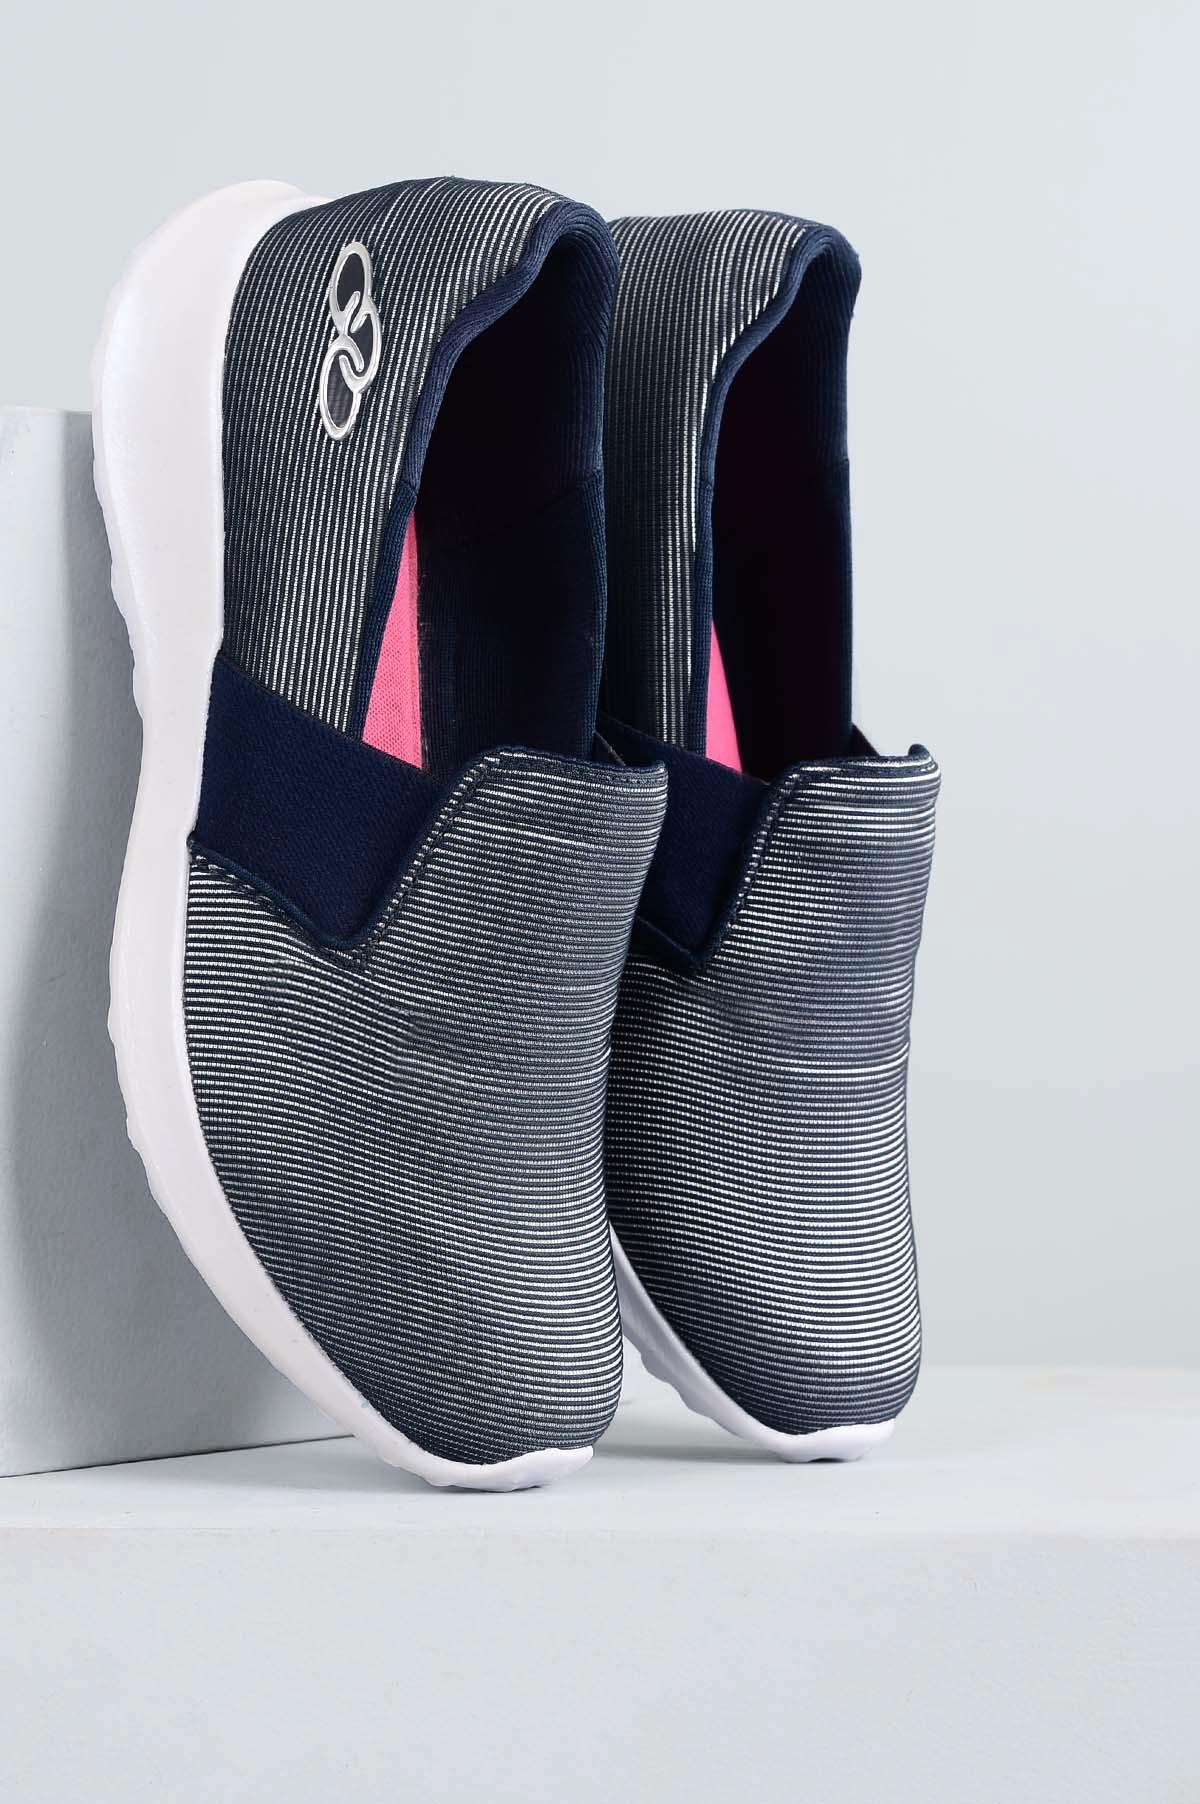 4a9db9012b5 Tênis Feminino Olympikus Love TEC - MARINHO - Mundial Calçados